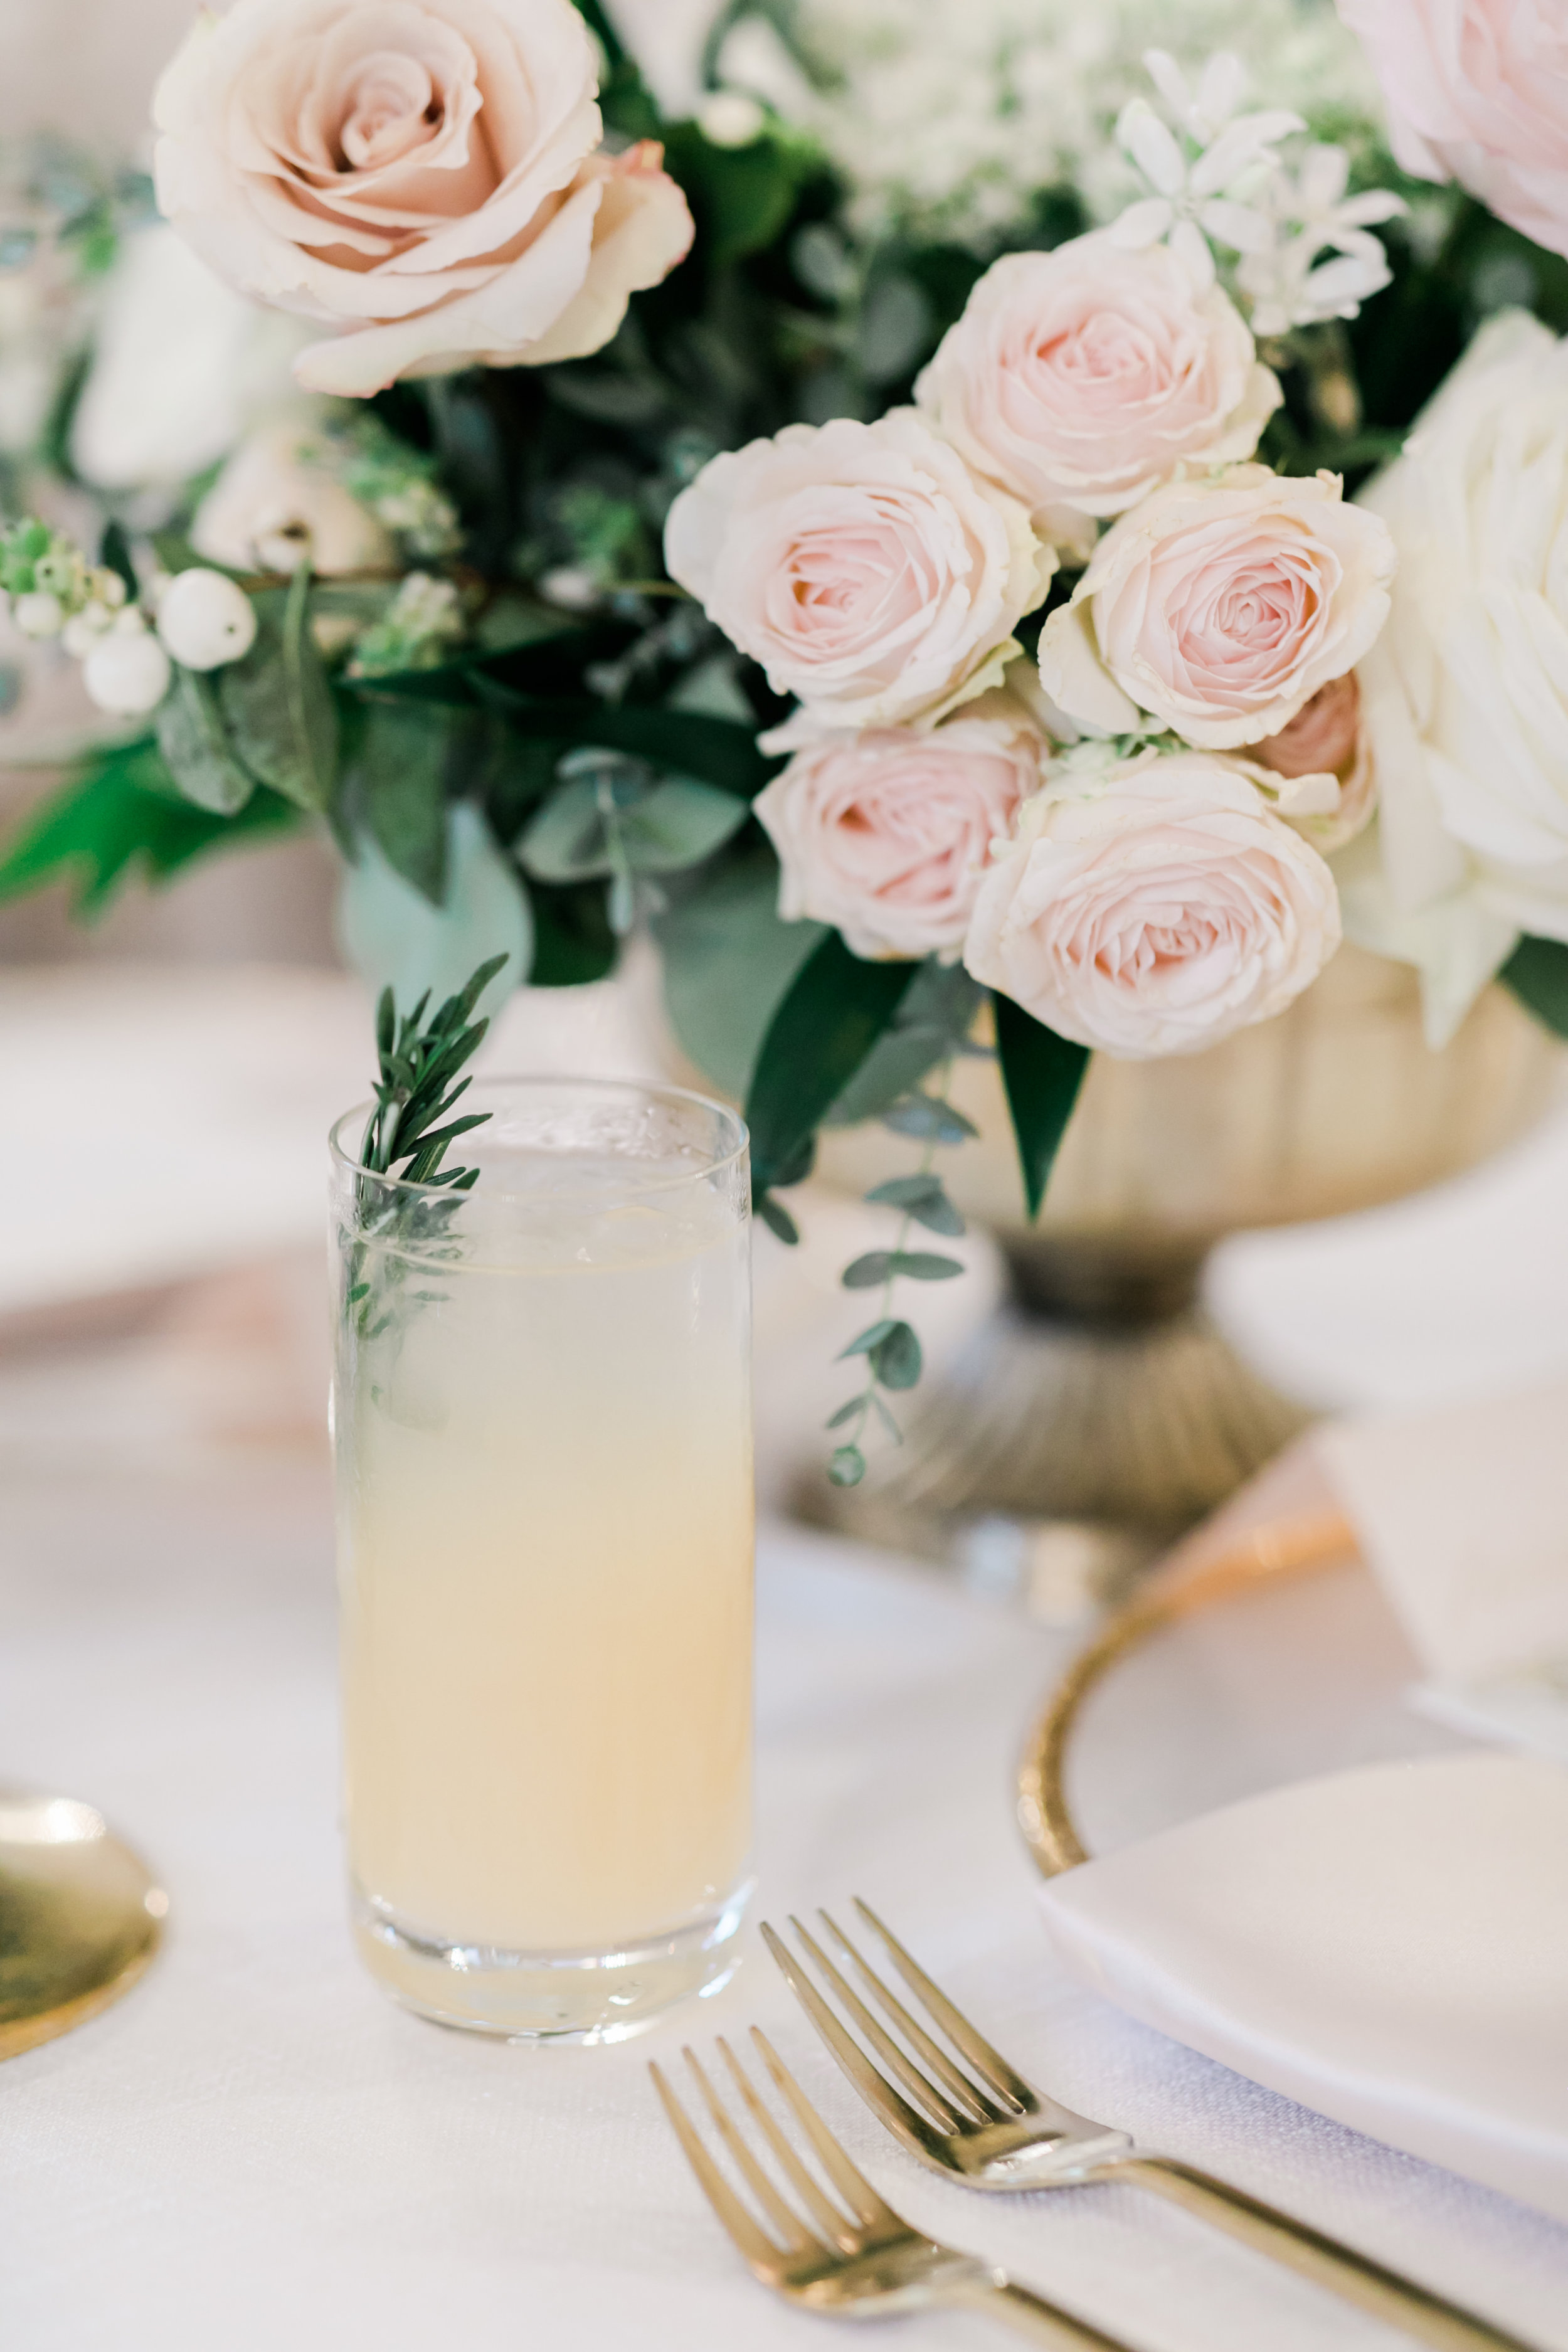 The Mansion at Woodward Park Tulsa Oklahoma Wedding_Valorie Darling Photography-9988.jpg